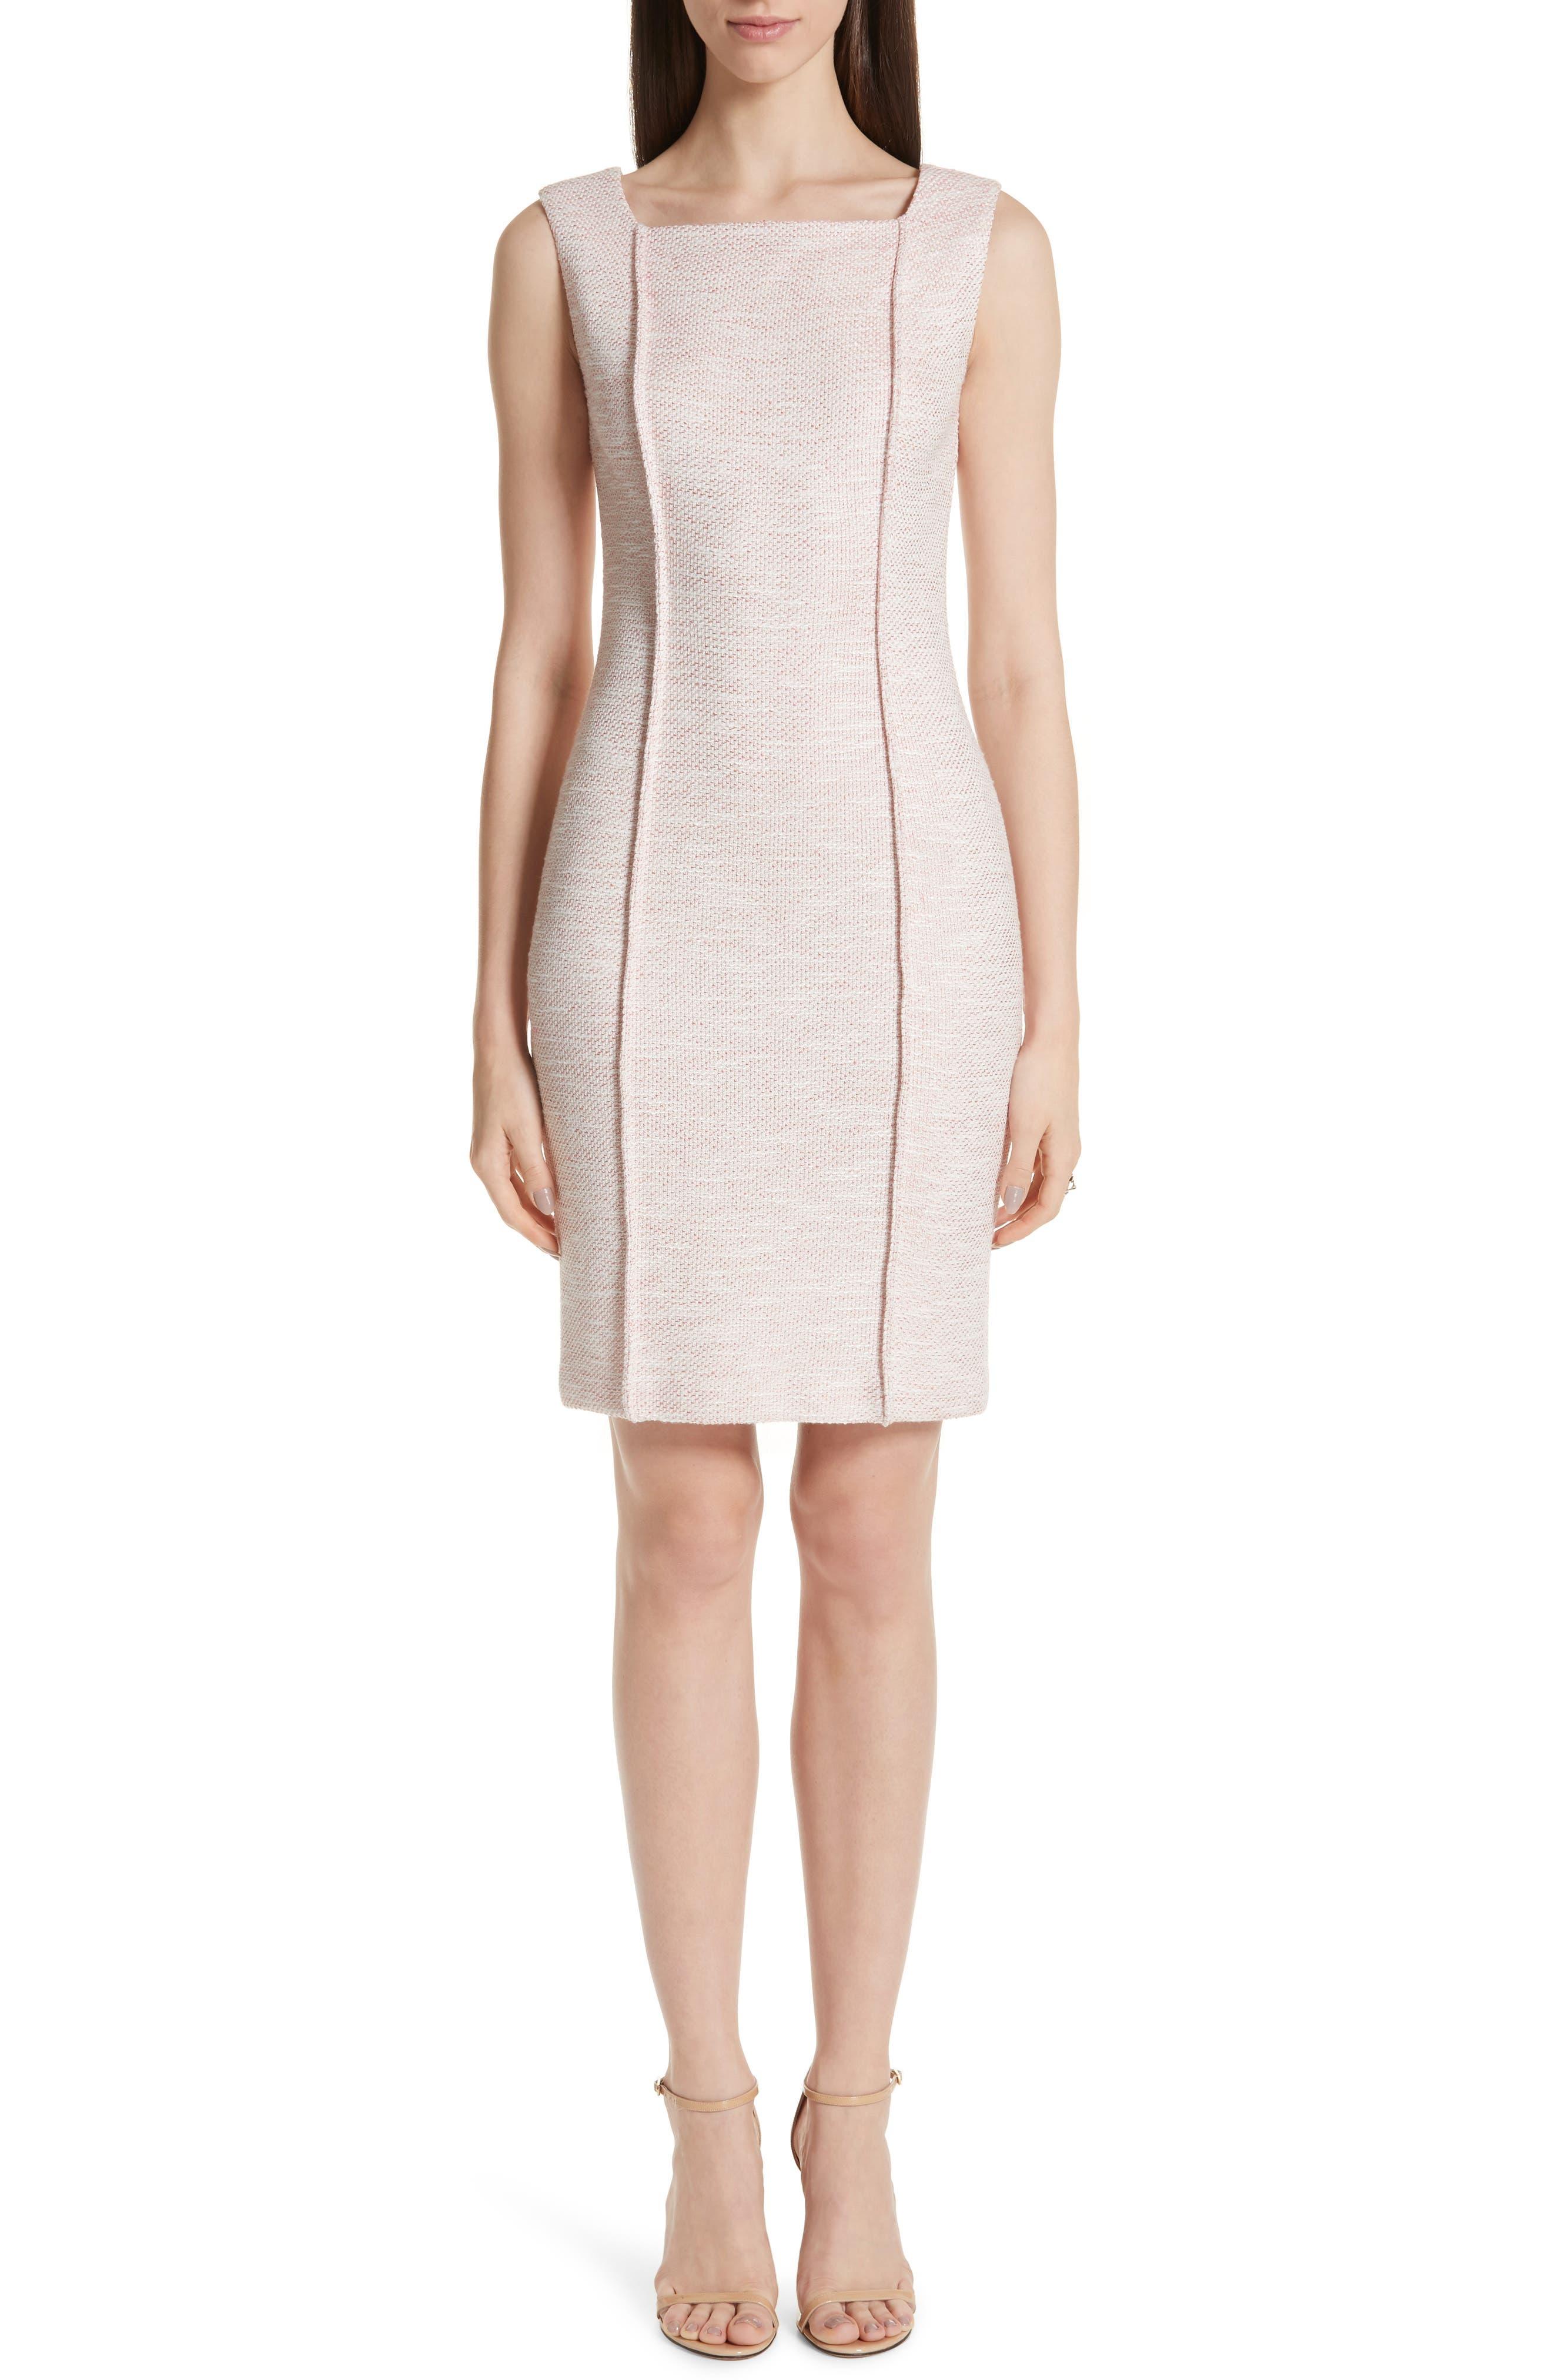 ST. JOHN COLLECTION Belinda Knit Square Neck Dress, Main, color, WHITE/ CORAL MULTI